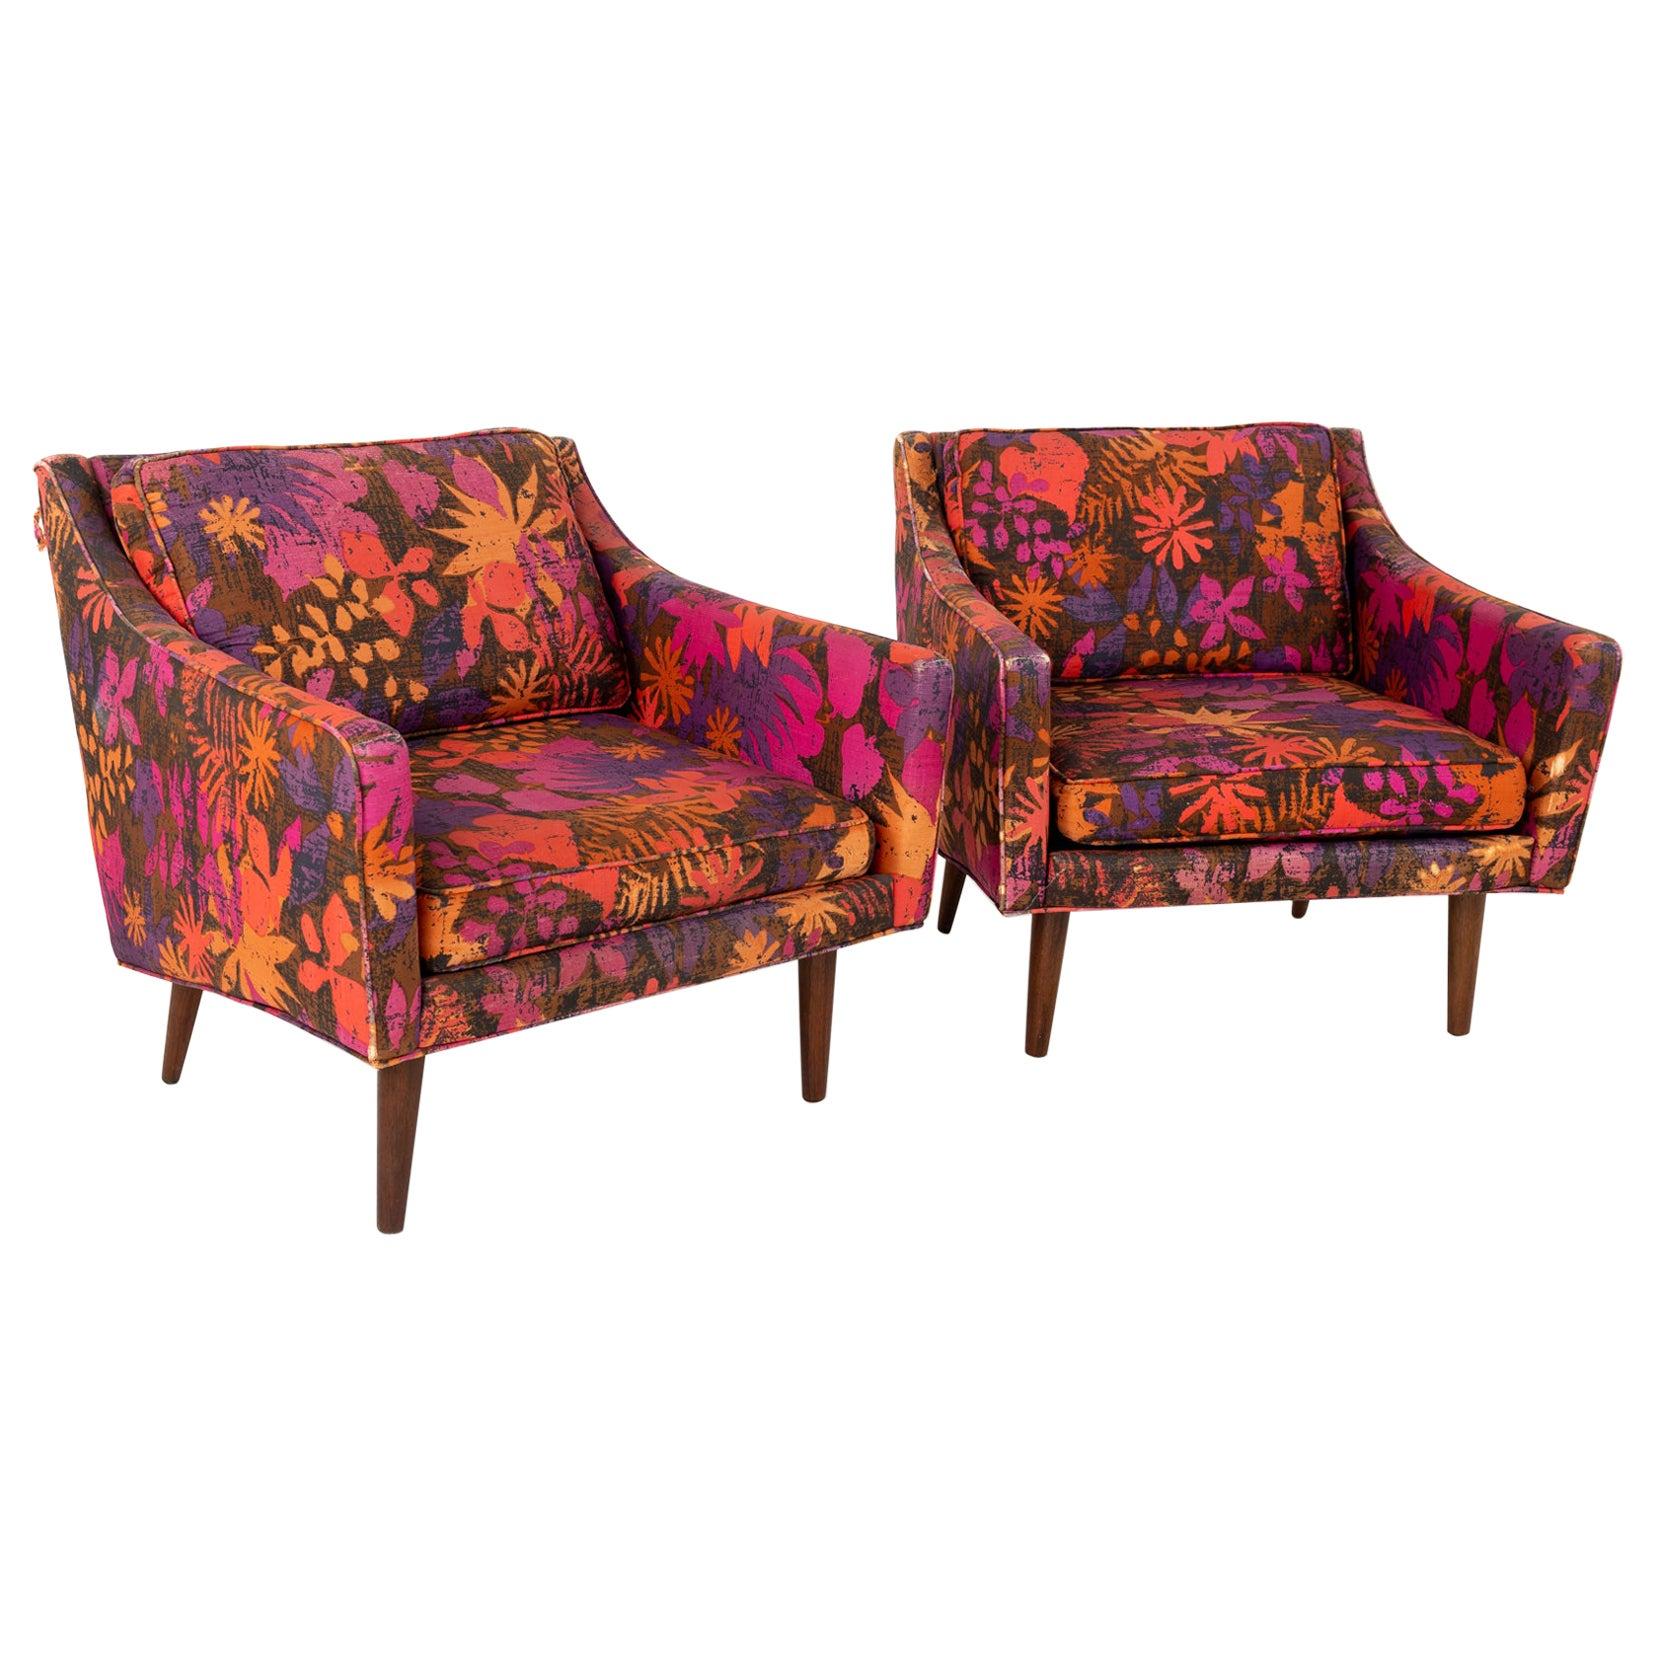 Milo Baughman for Thayer Coggin Mid Century Lounge Chairs, Pair